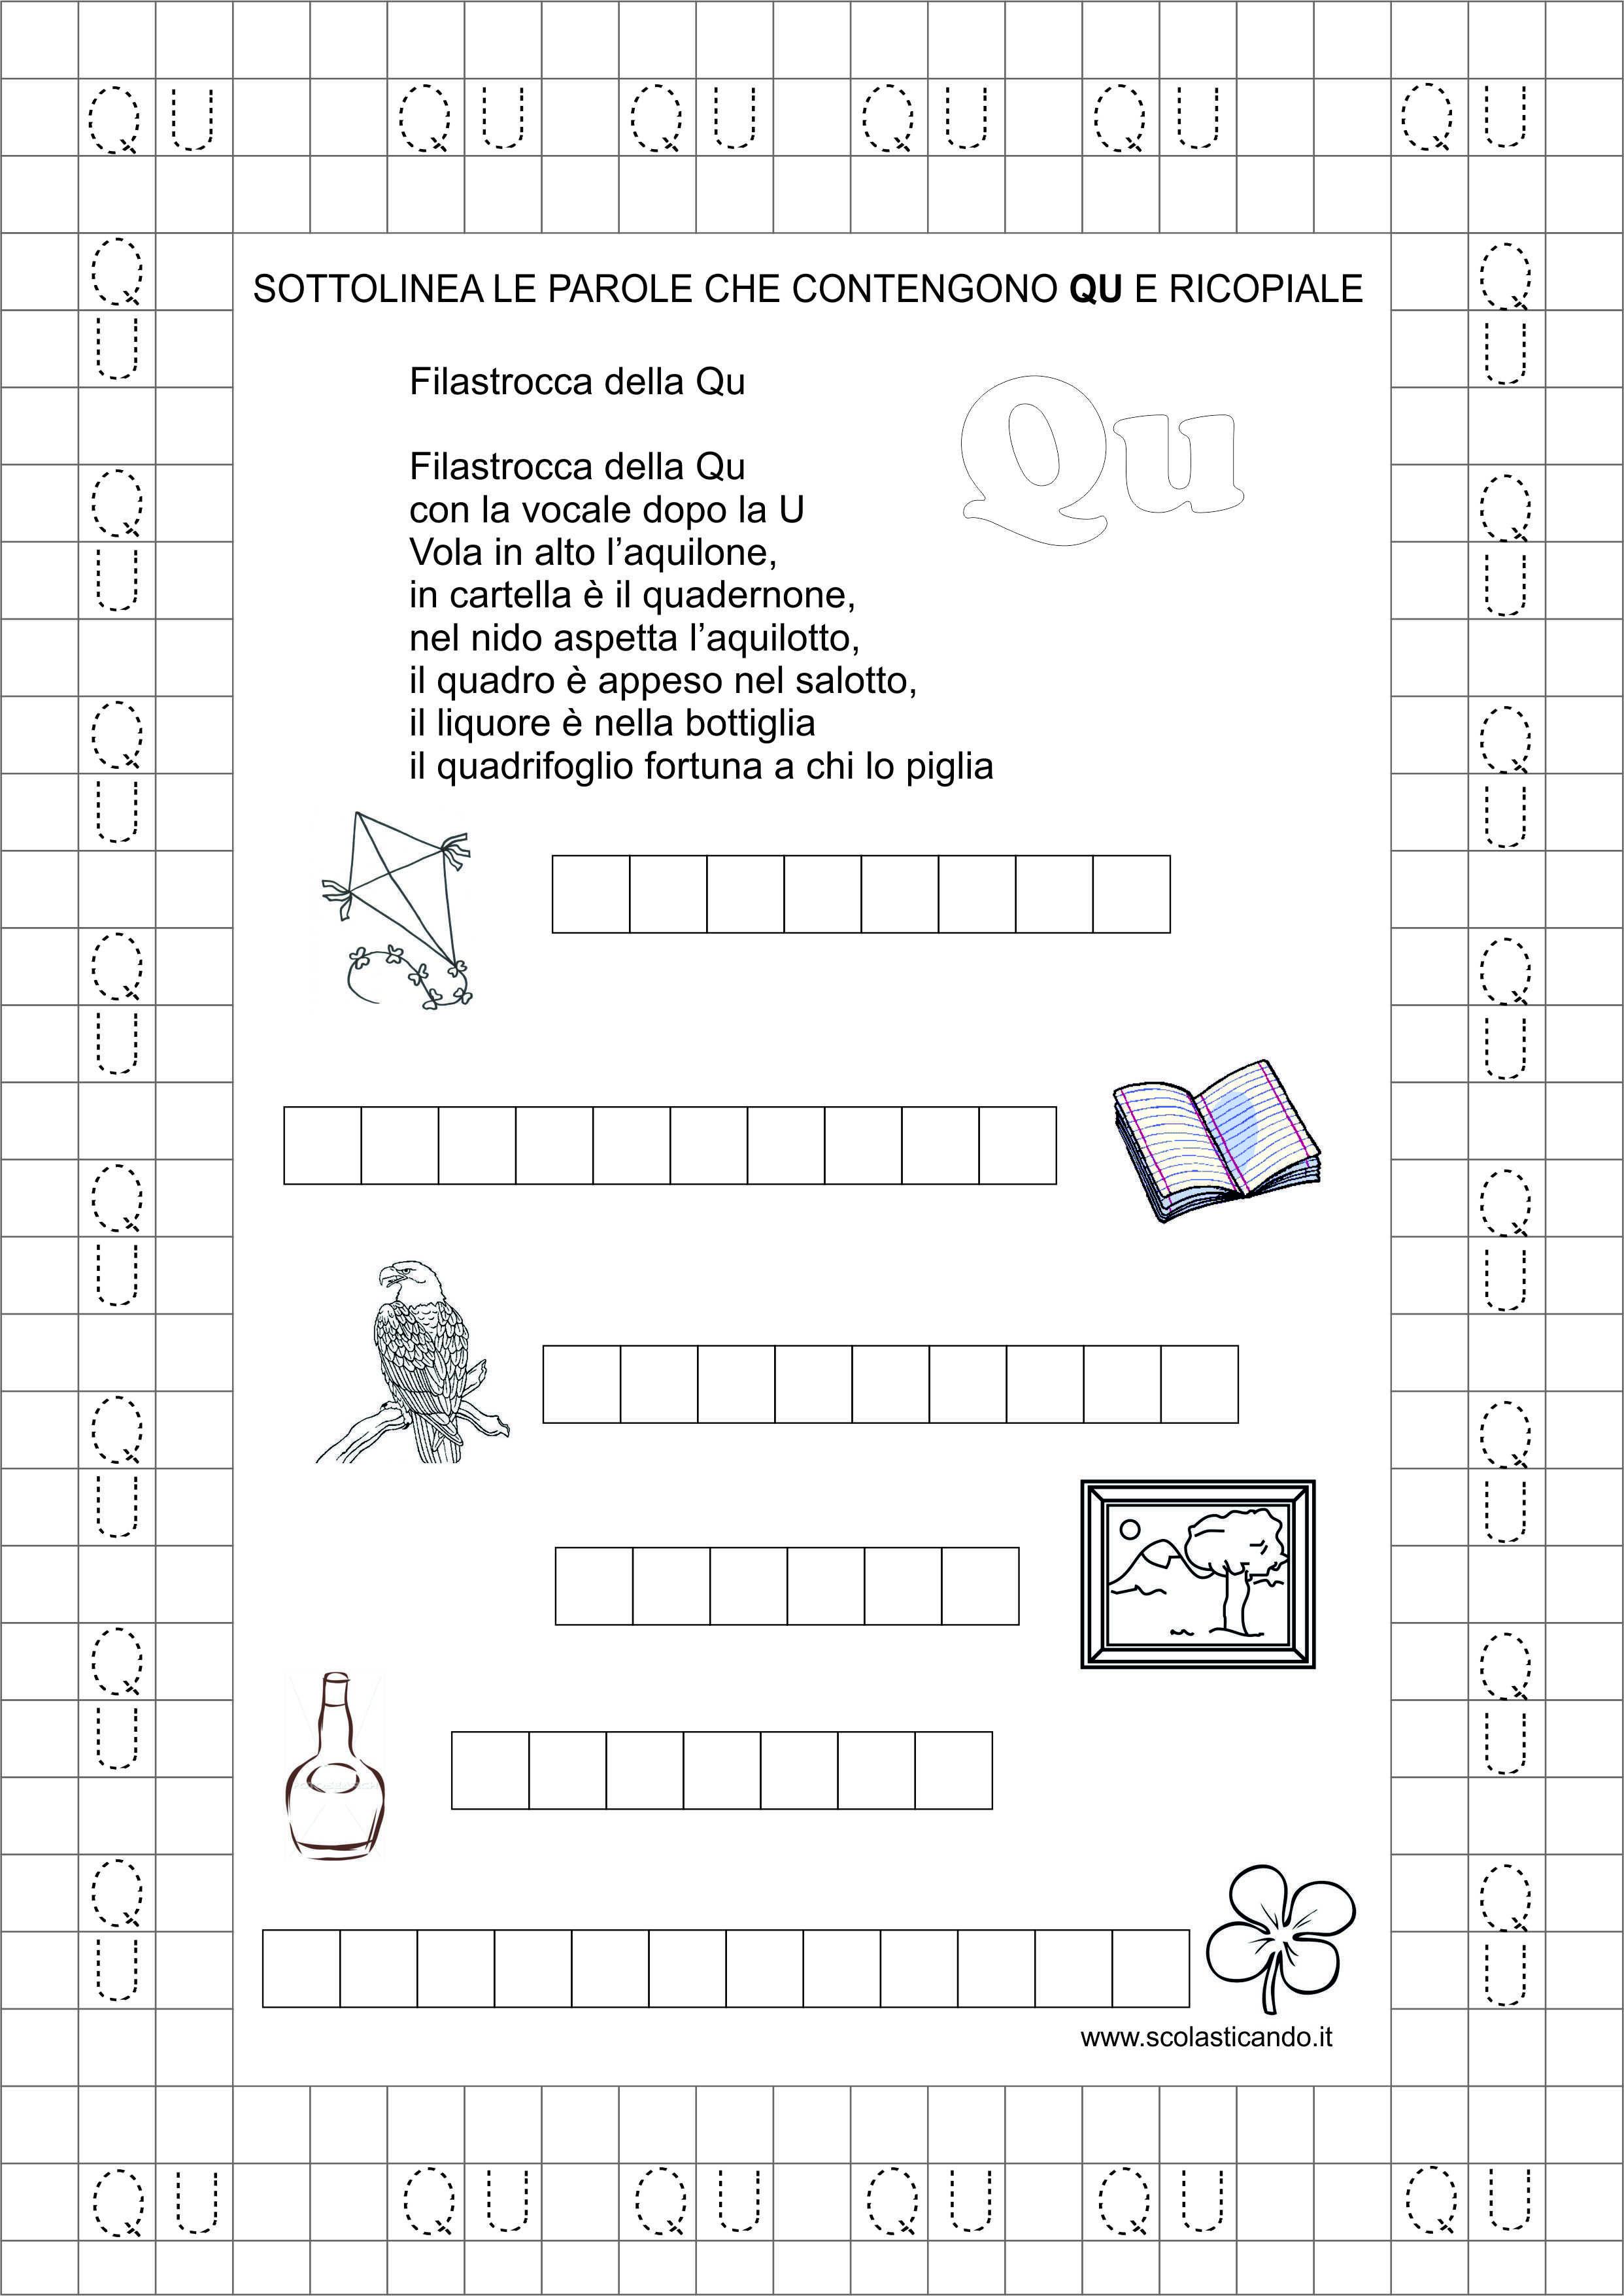 Ben noto Classe prima: schede didattiche Qu da scaricare | Scolasticando  LK46